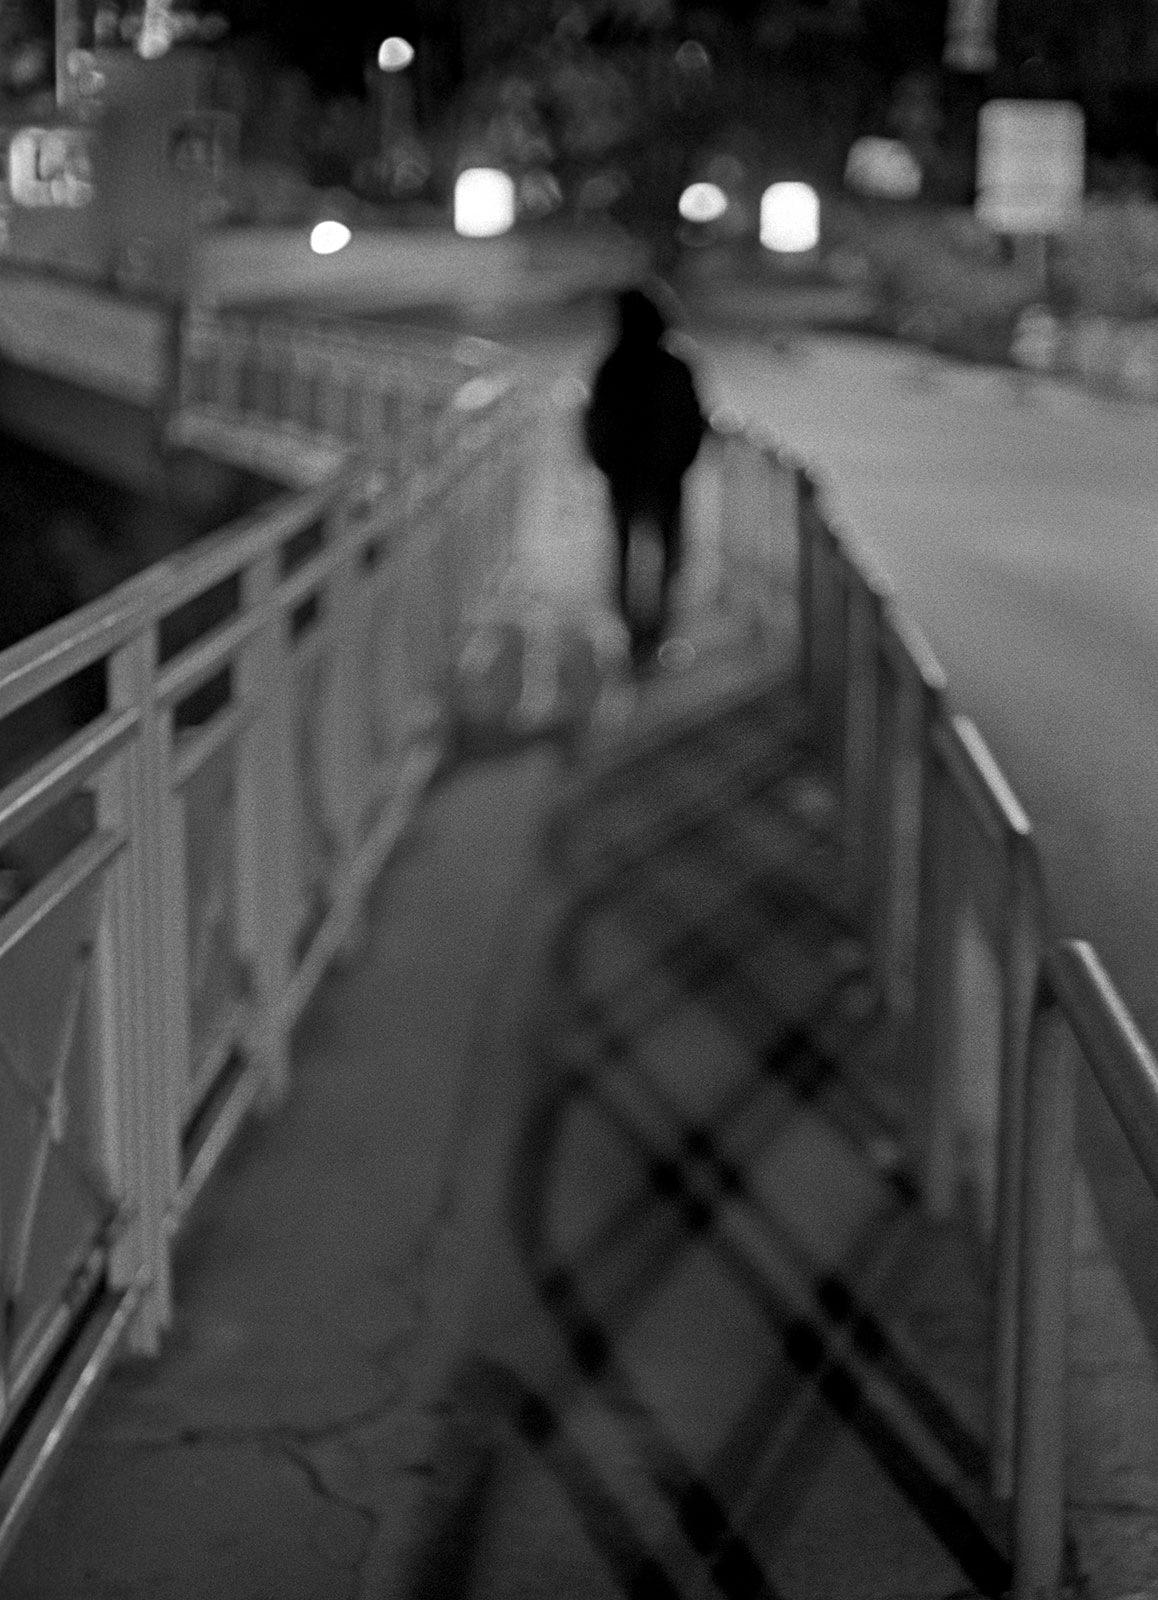 Love lost by Marek Fogiel